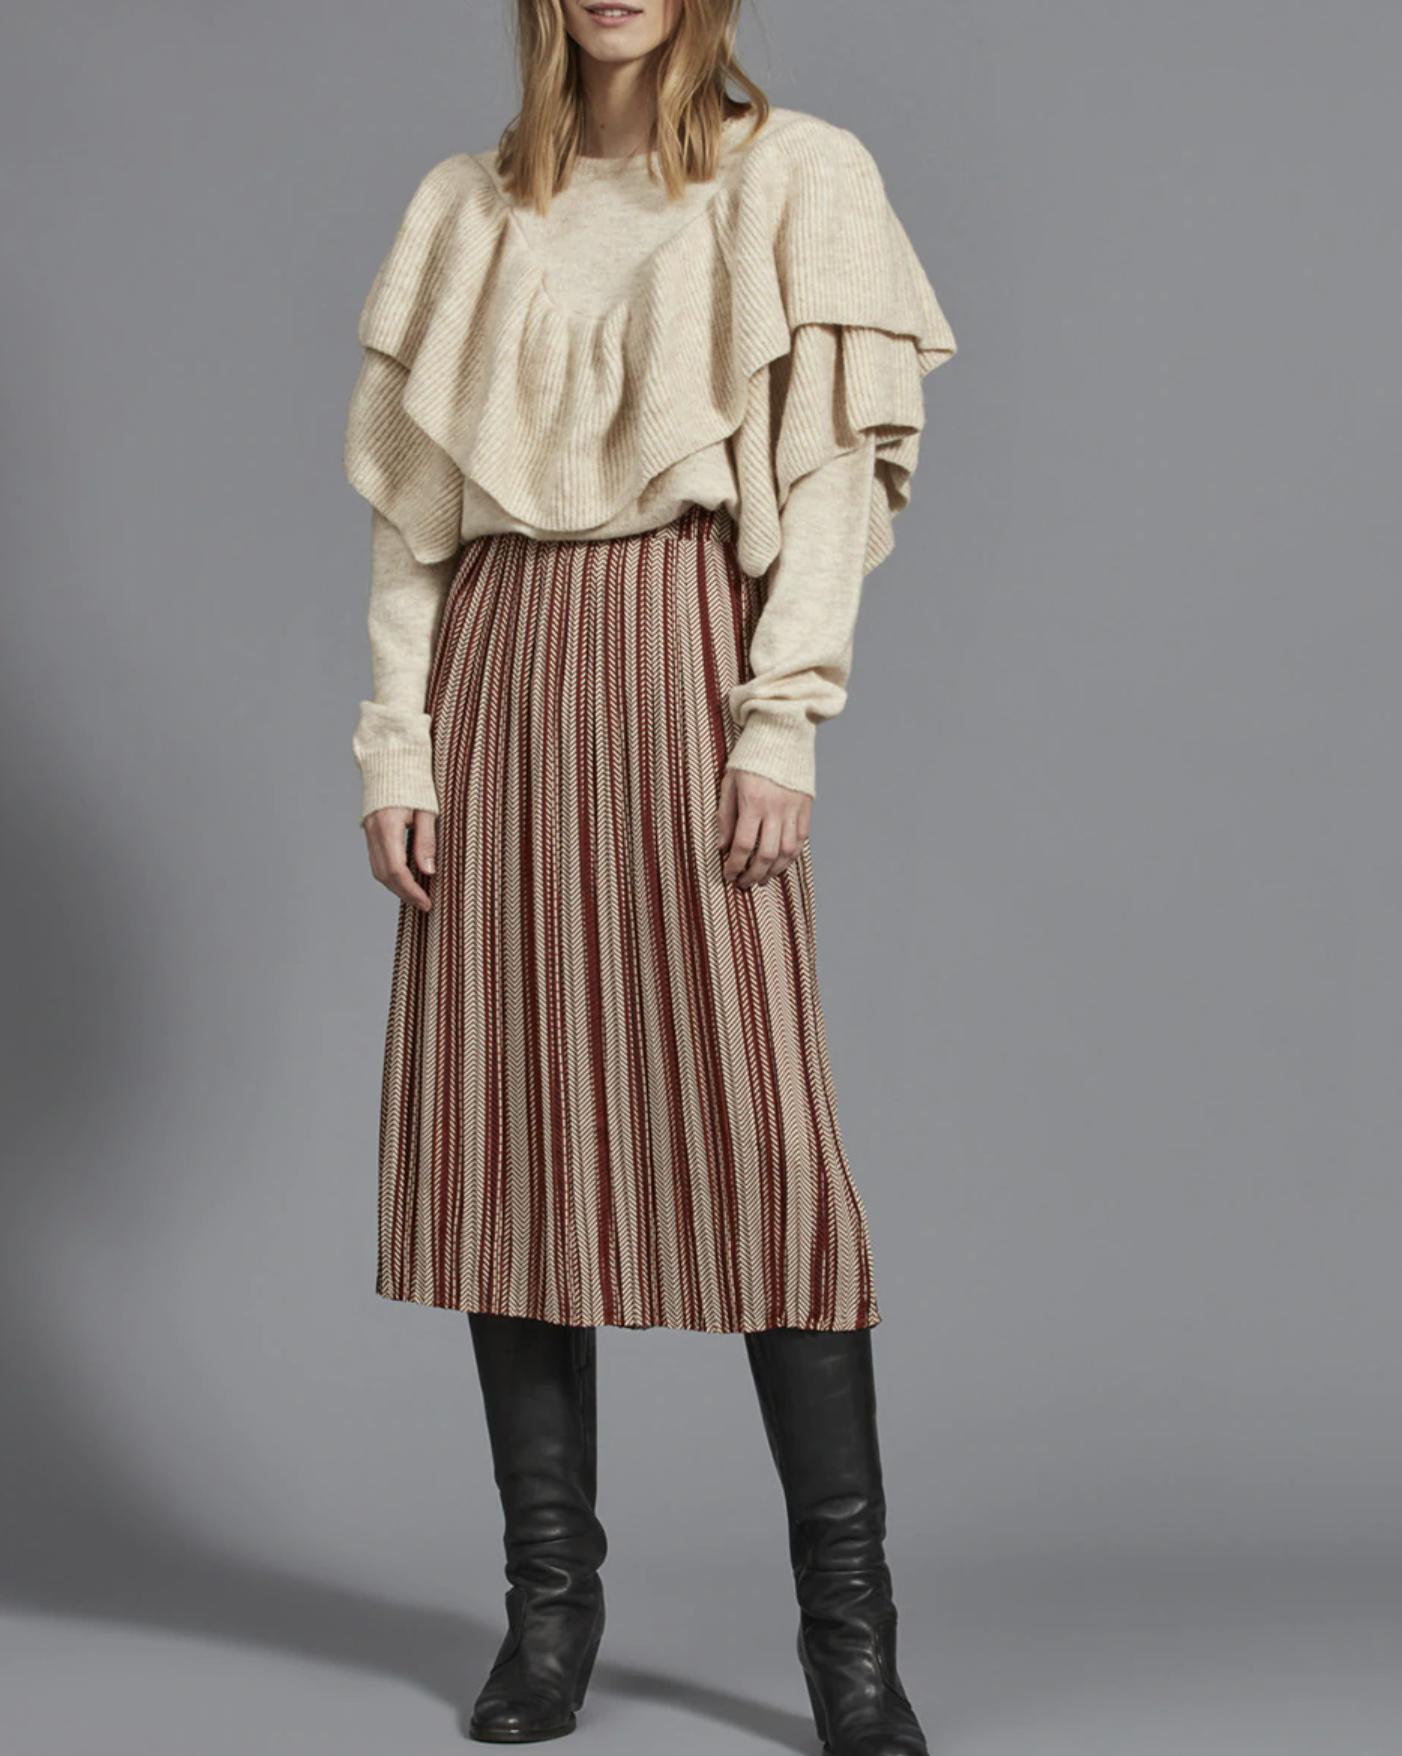 Falda de mujer midi estampada